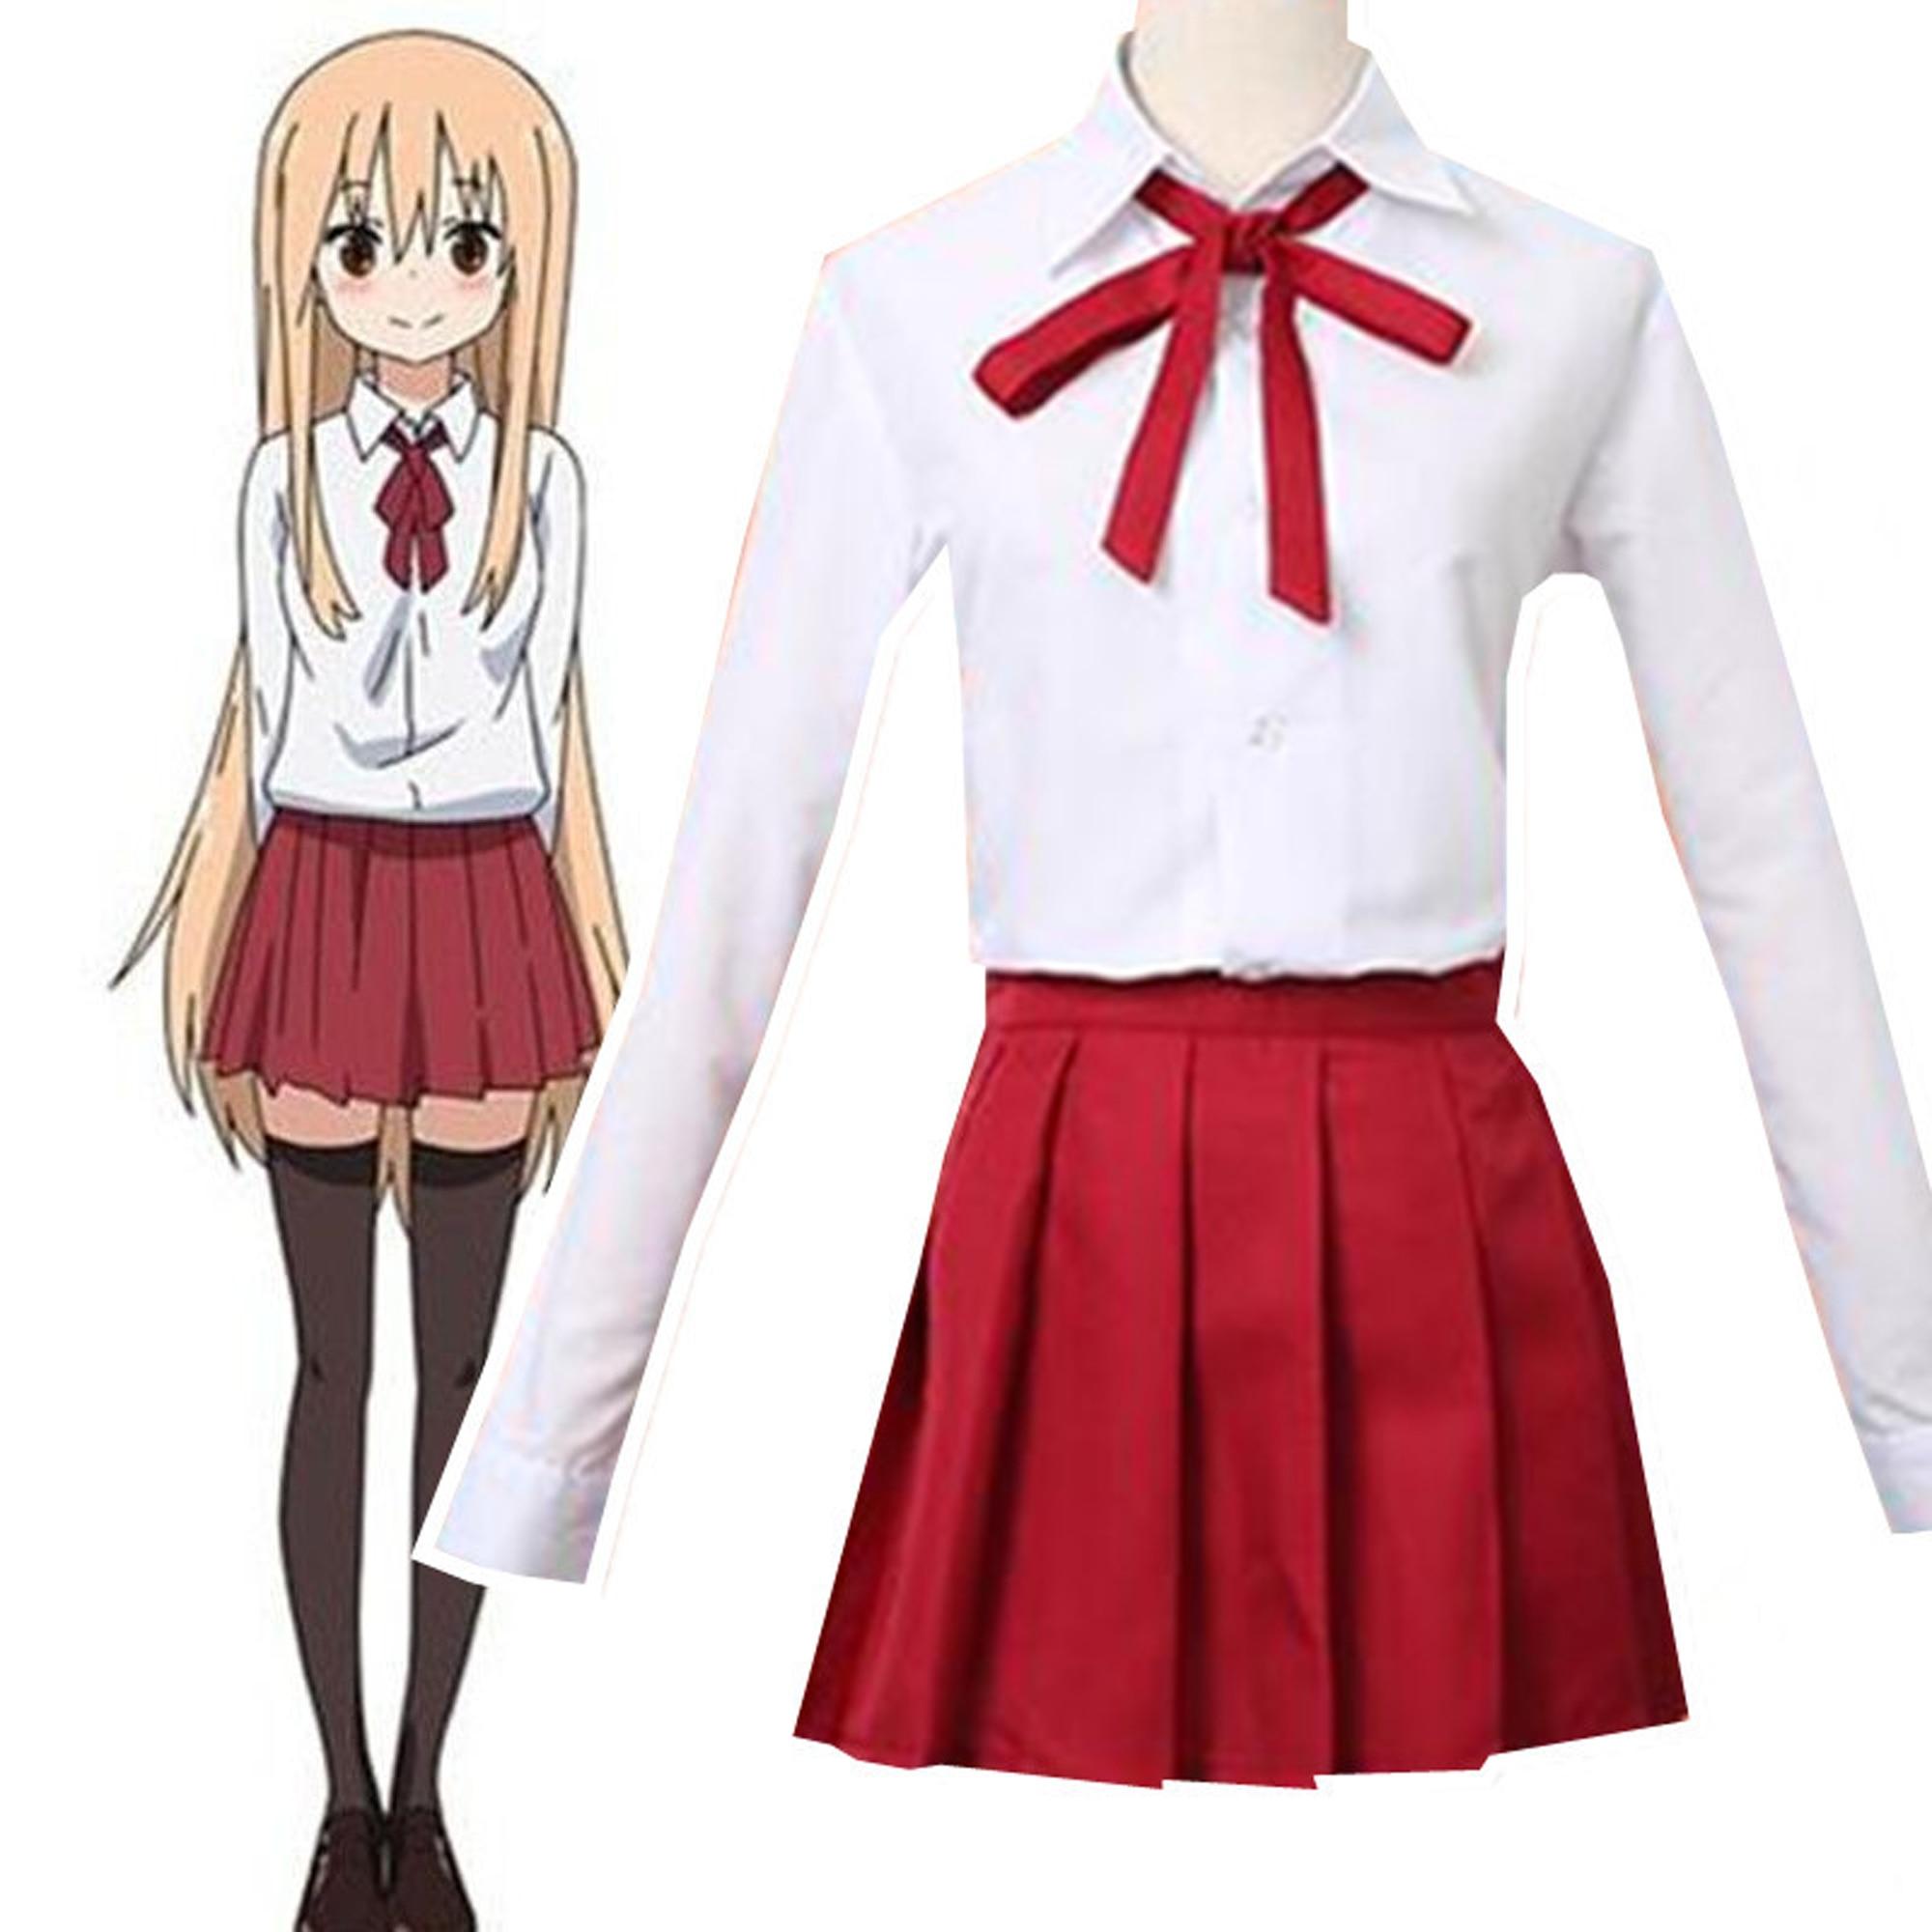 Doma Umaru cosplay costumes Japan and South Korea school uniform Japanese anime Himouto! Umaru-chan clothing